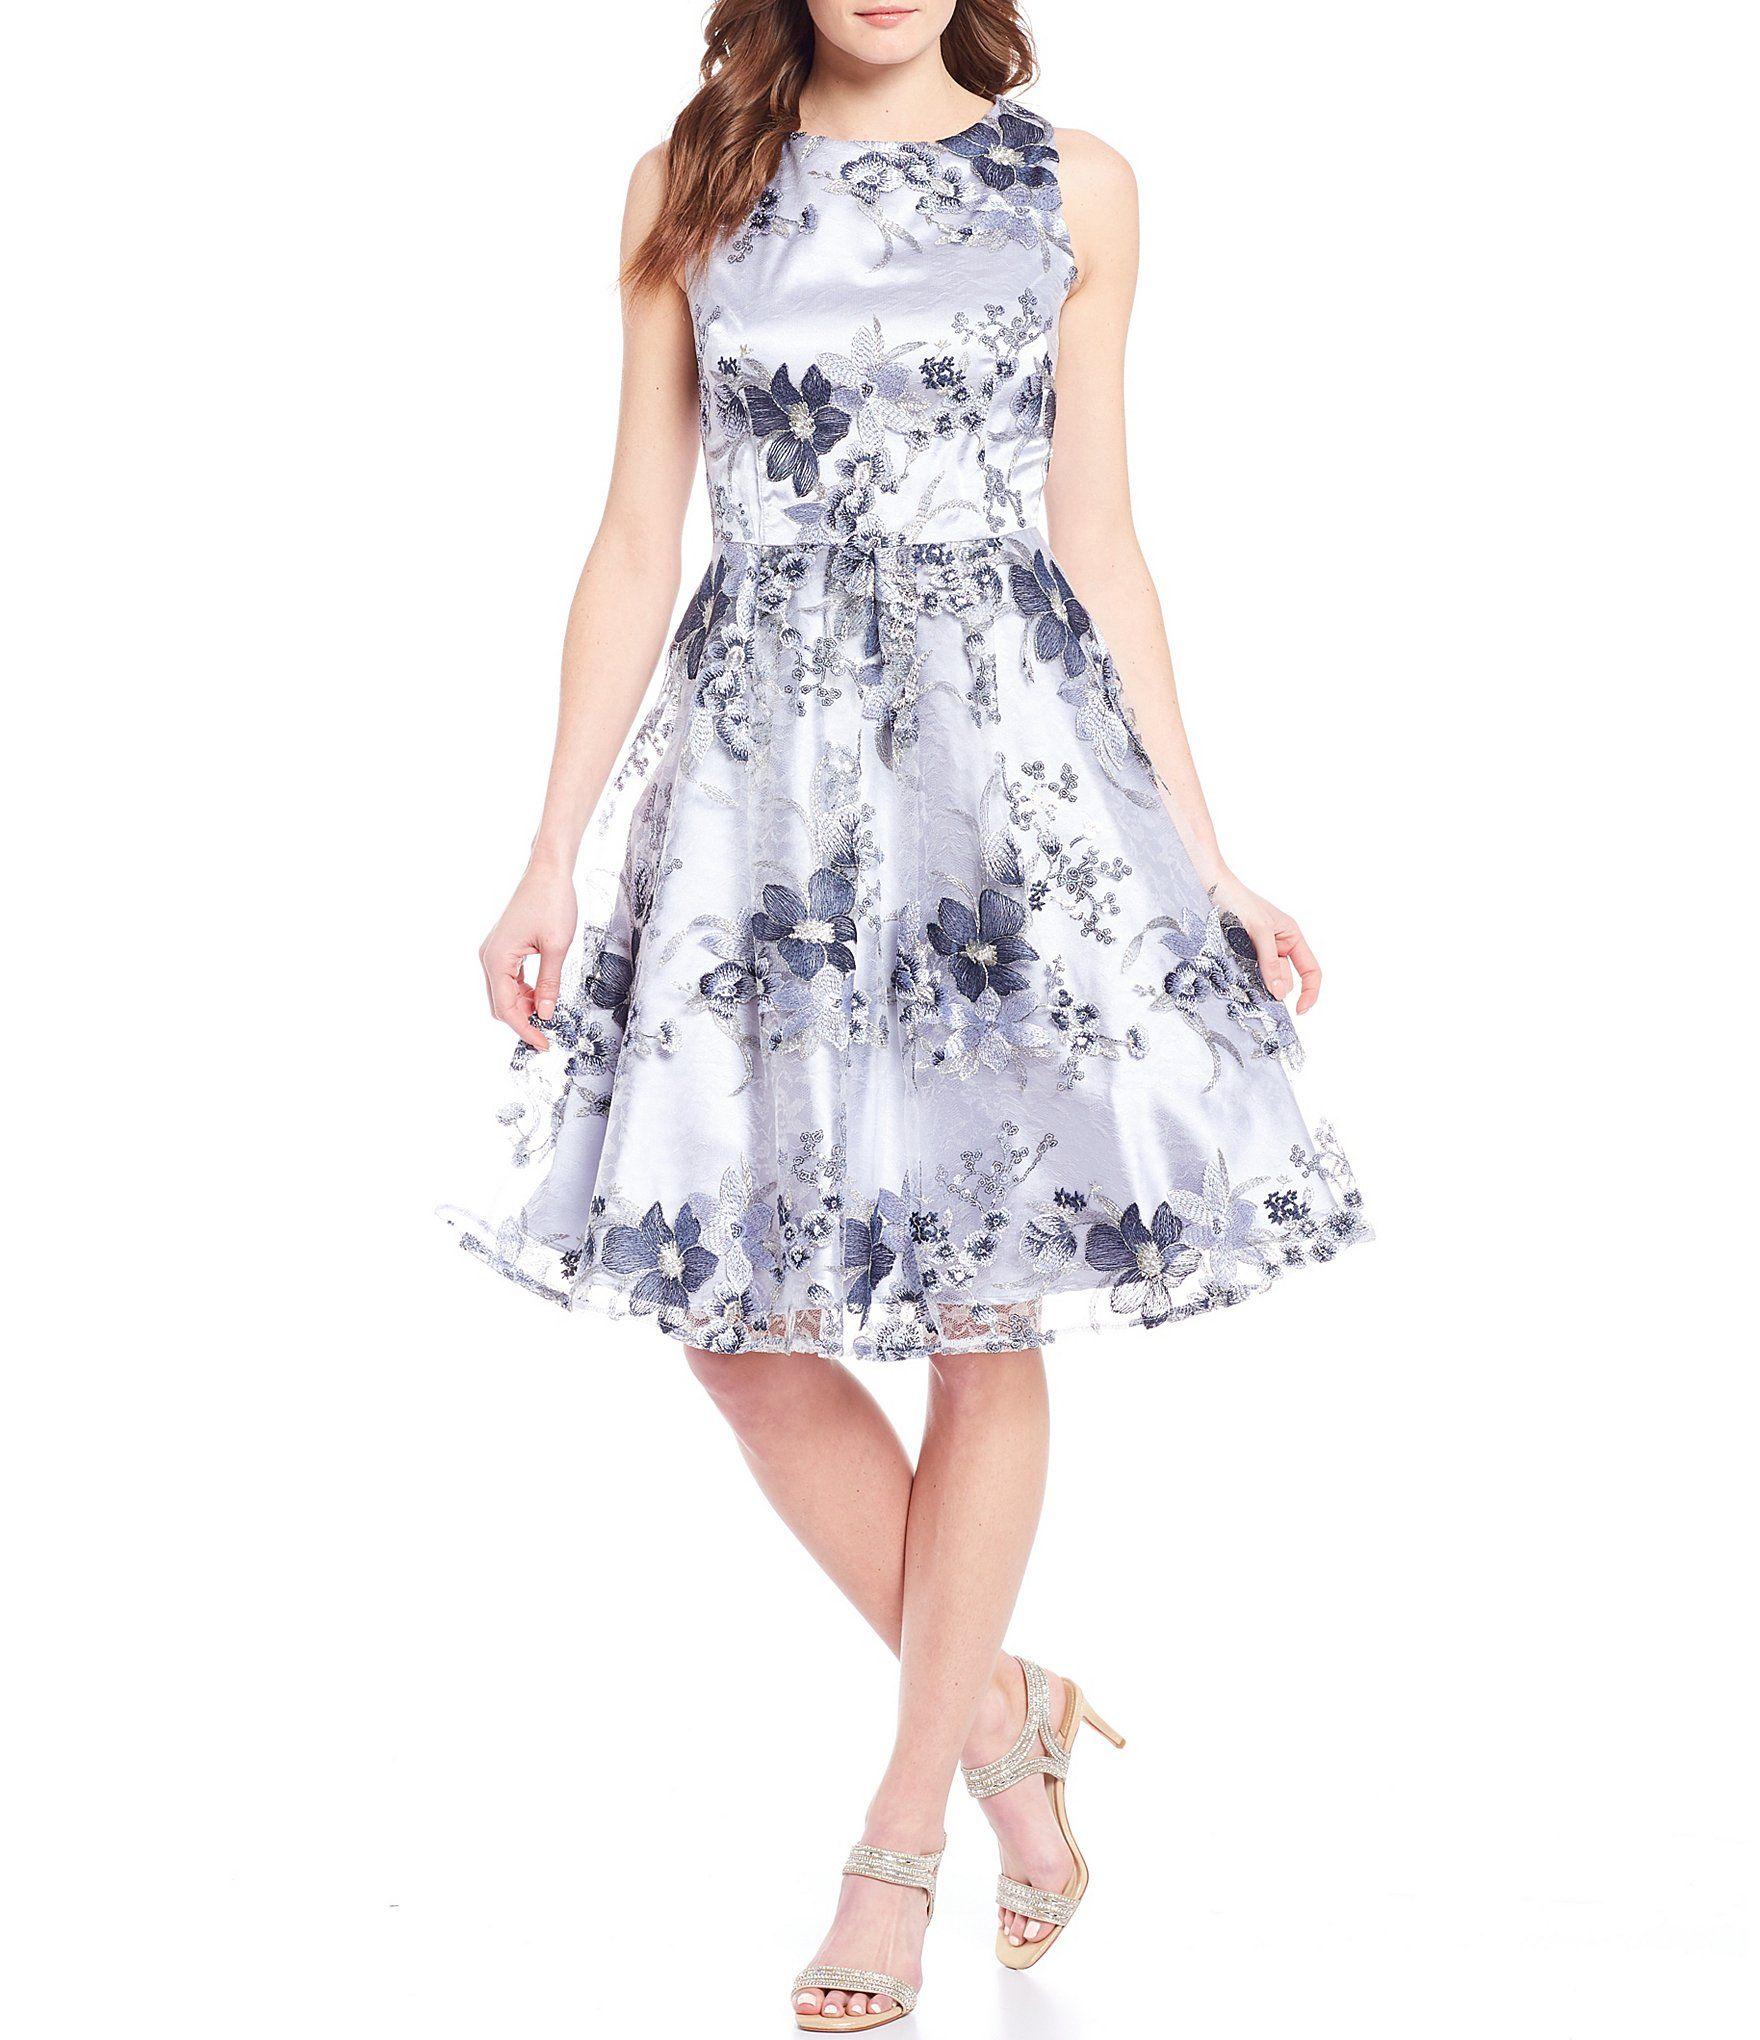 Tahari Asl Floral Embroidered Metallic Party Dress Dillard S In 2020 Metallic Party Dresses Womens Midi Dresses Embroidered Dress